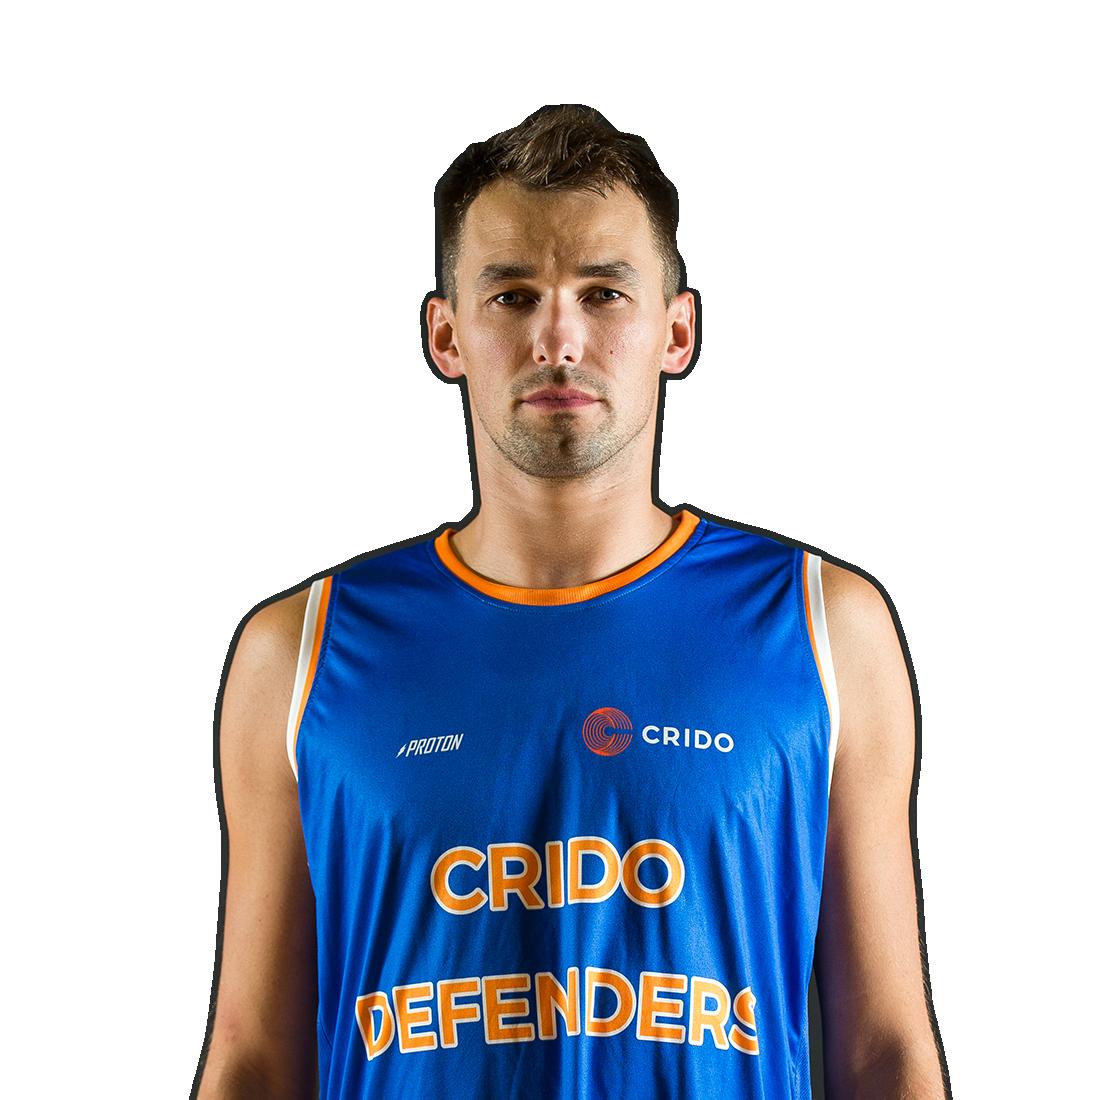 Adam Borsukiewicz